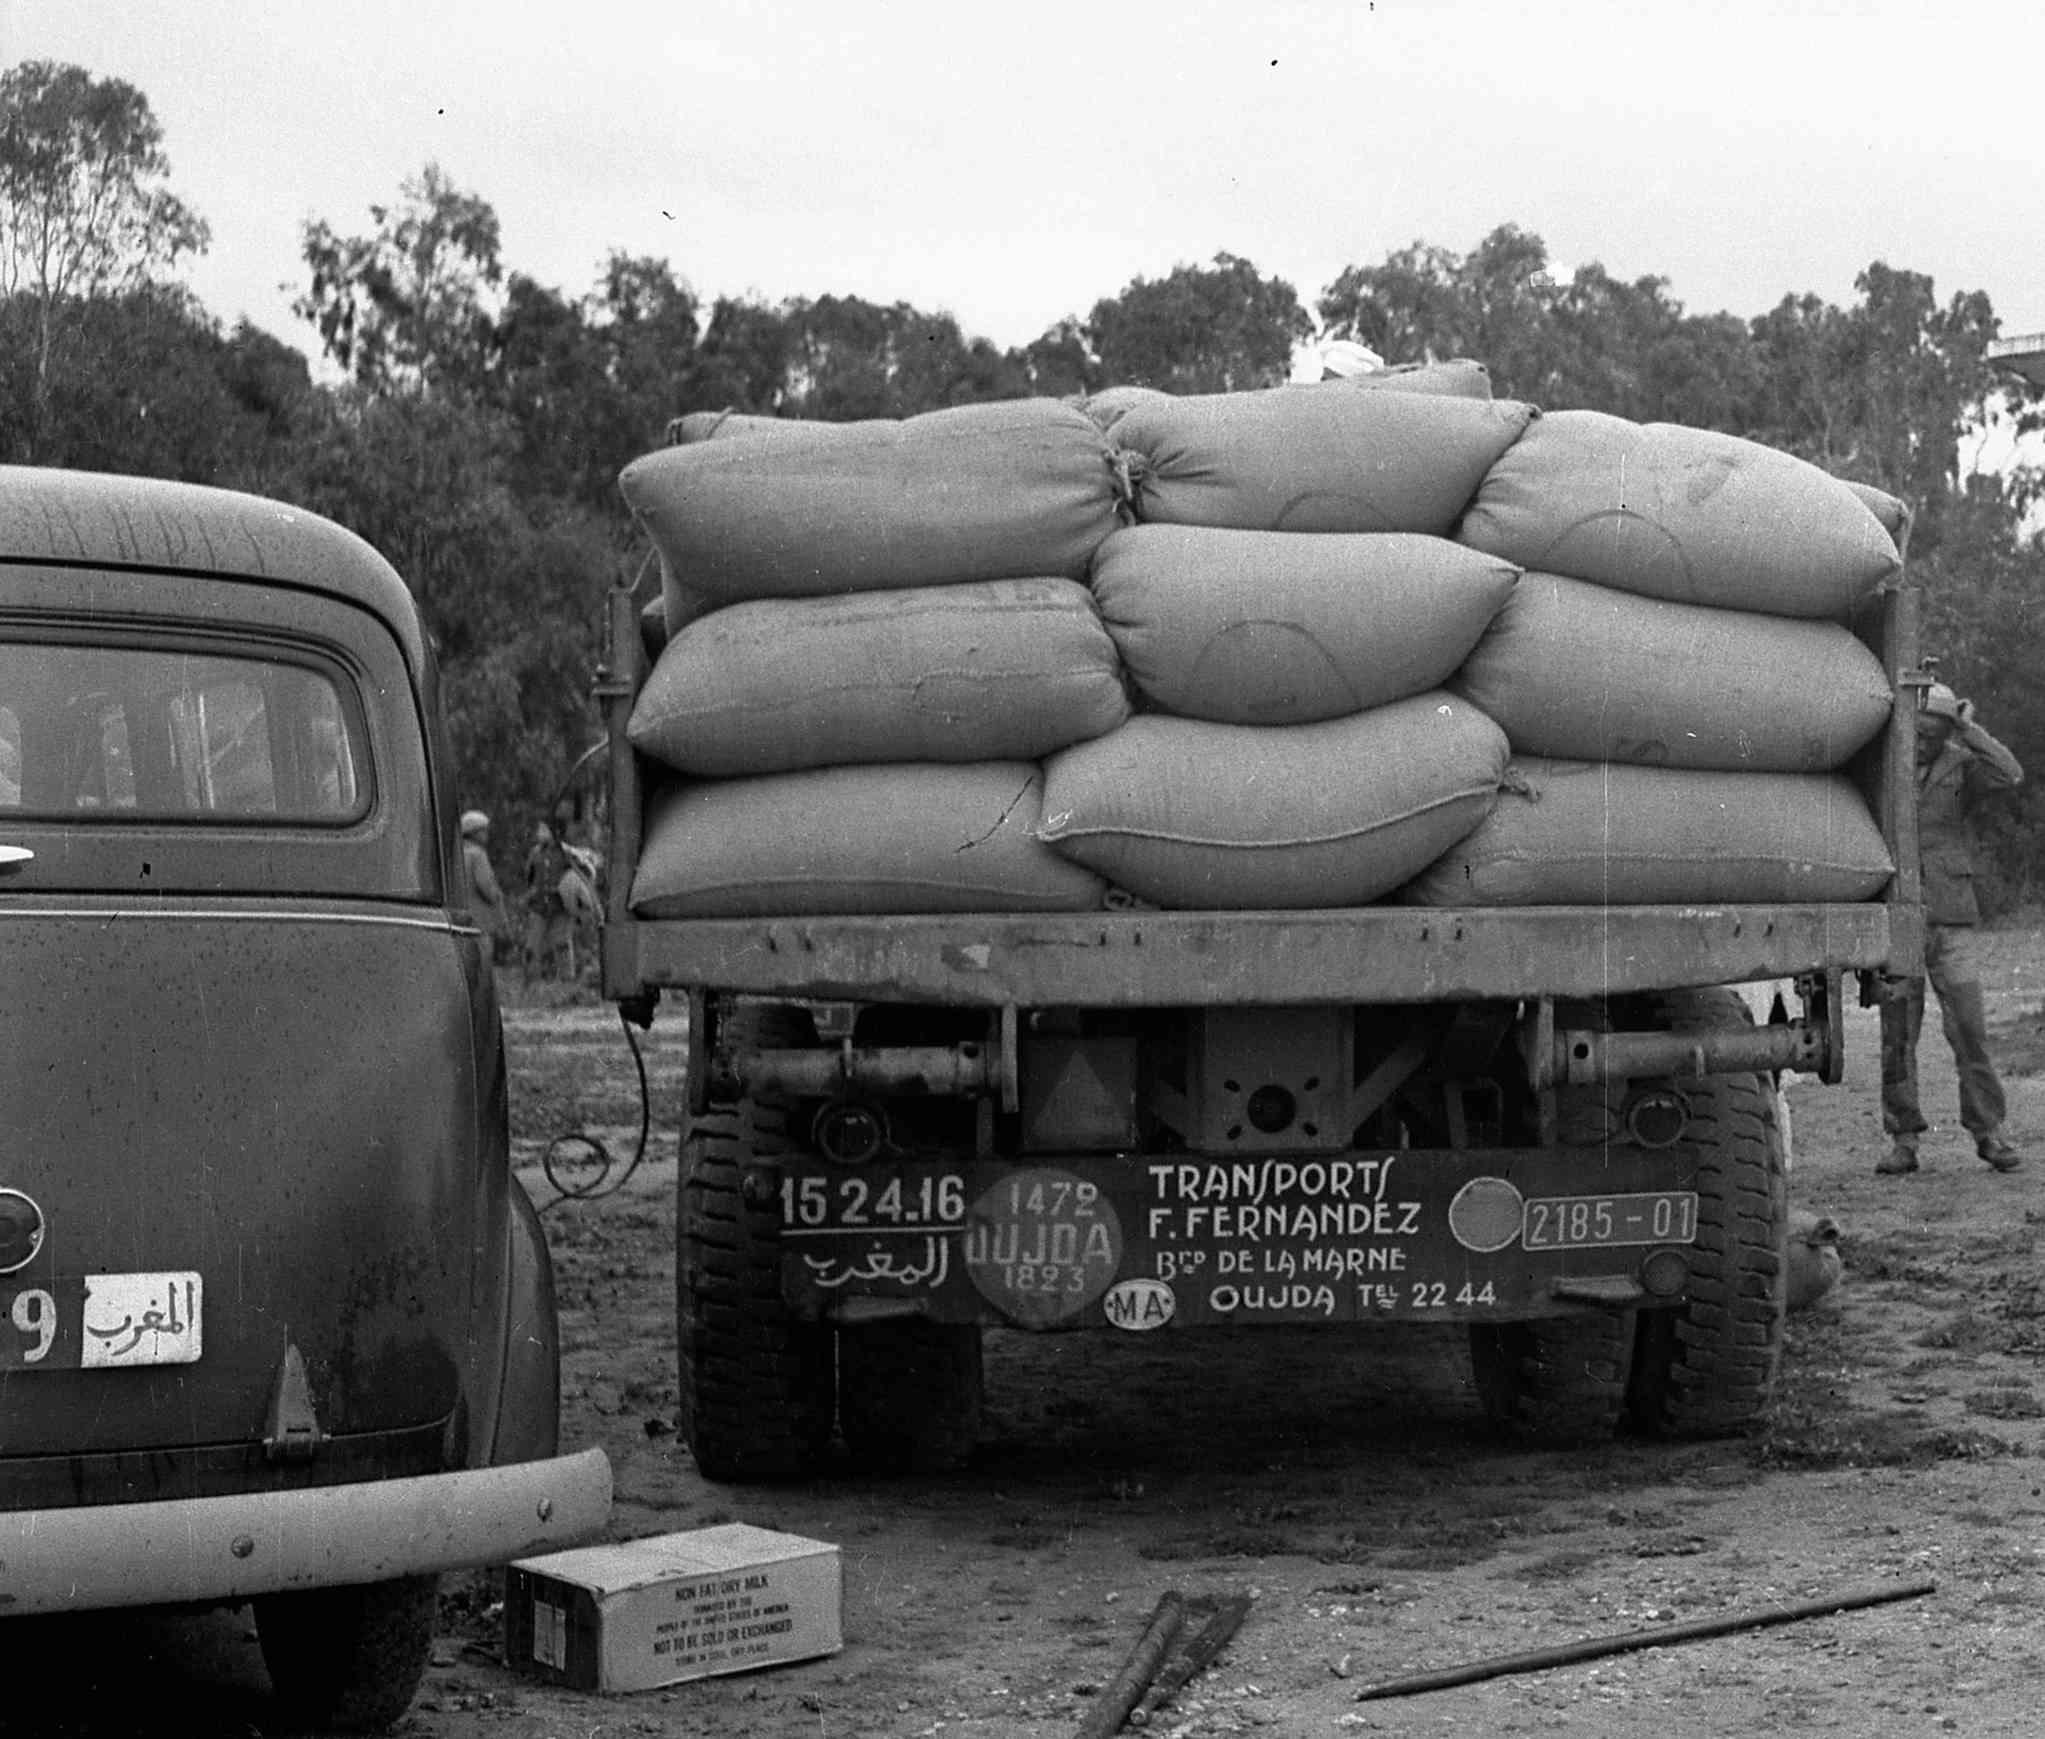 Transport Routier au Maroc - Histoire - Page 2 Magiru11